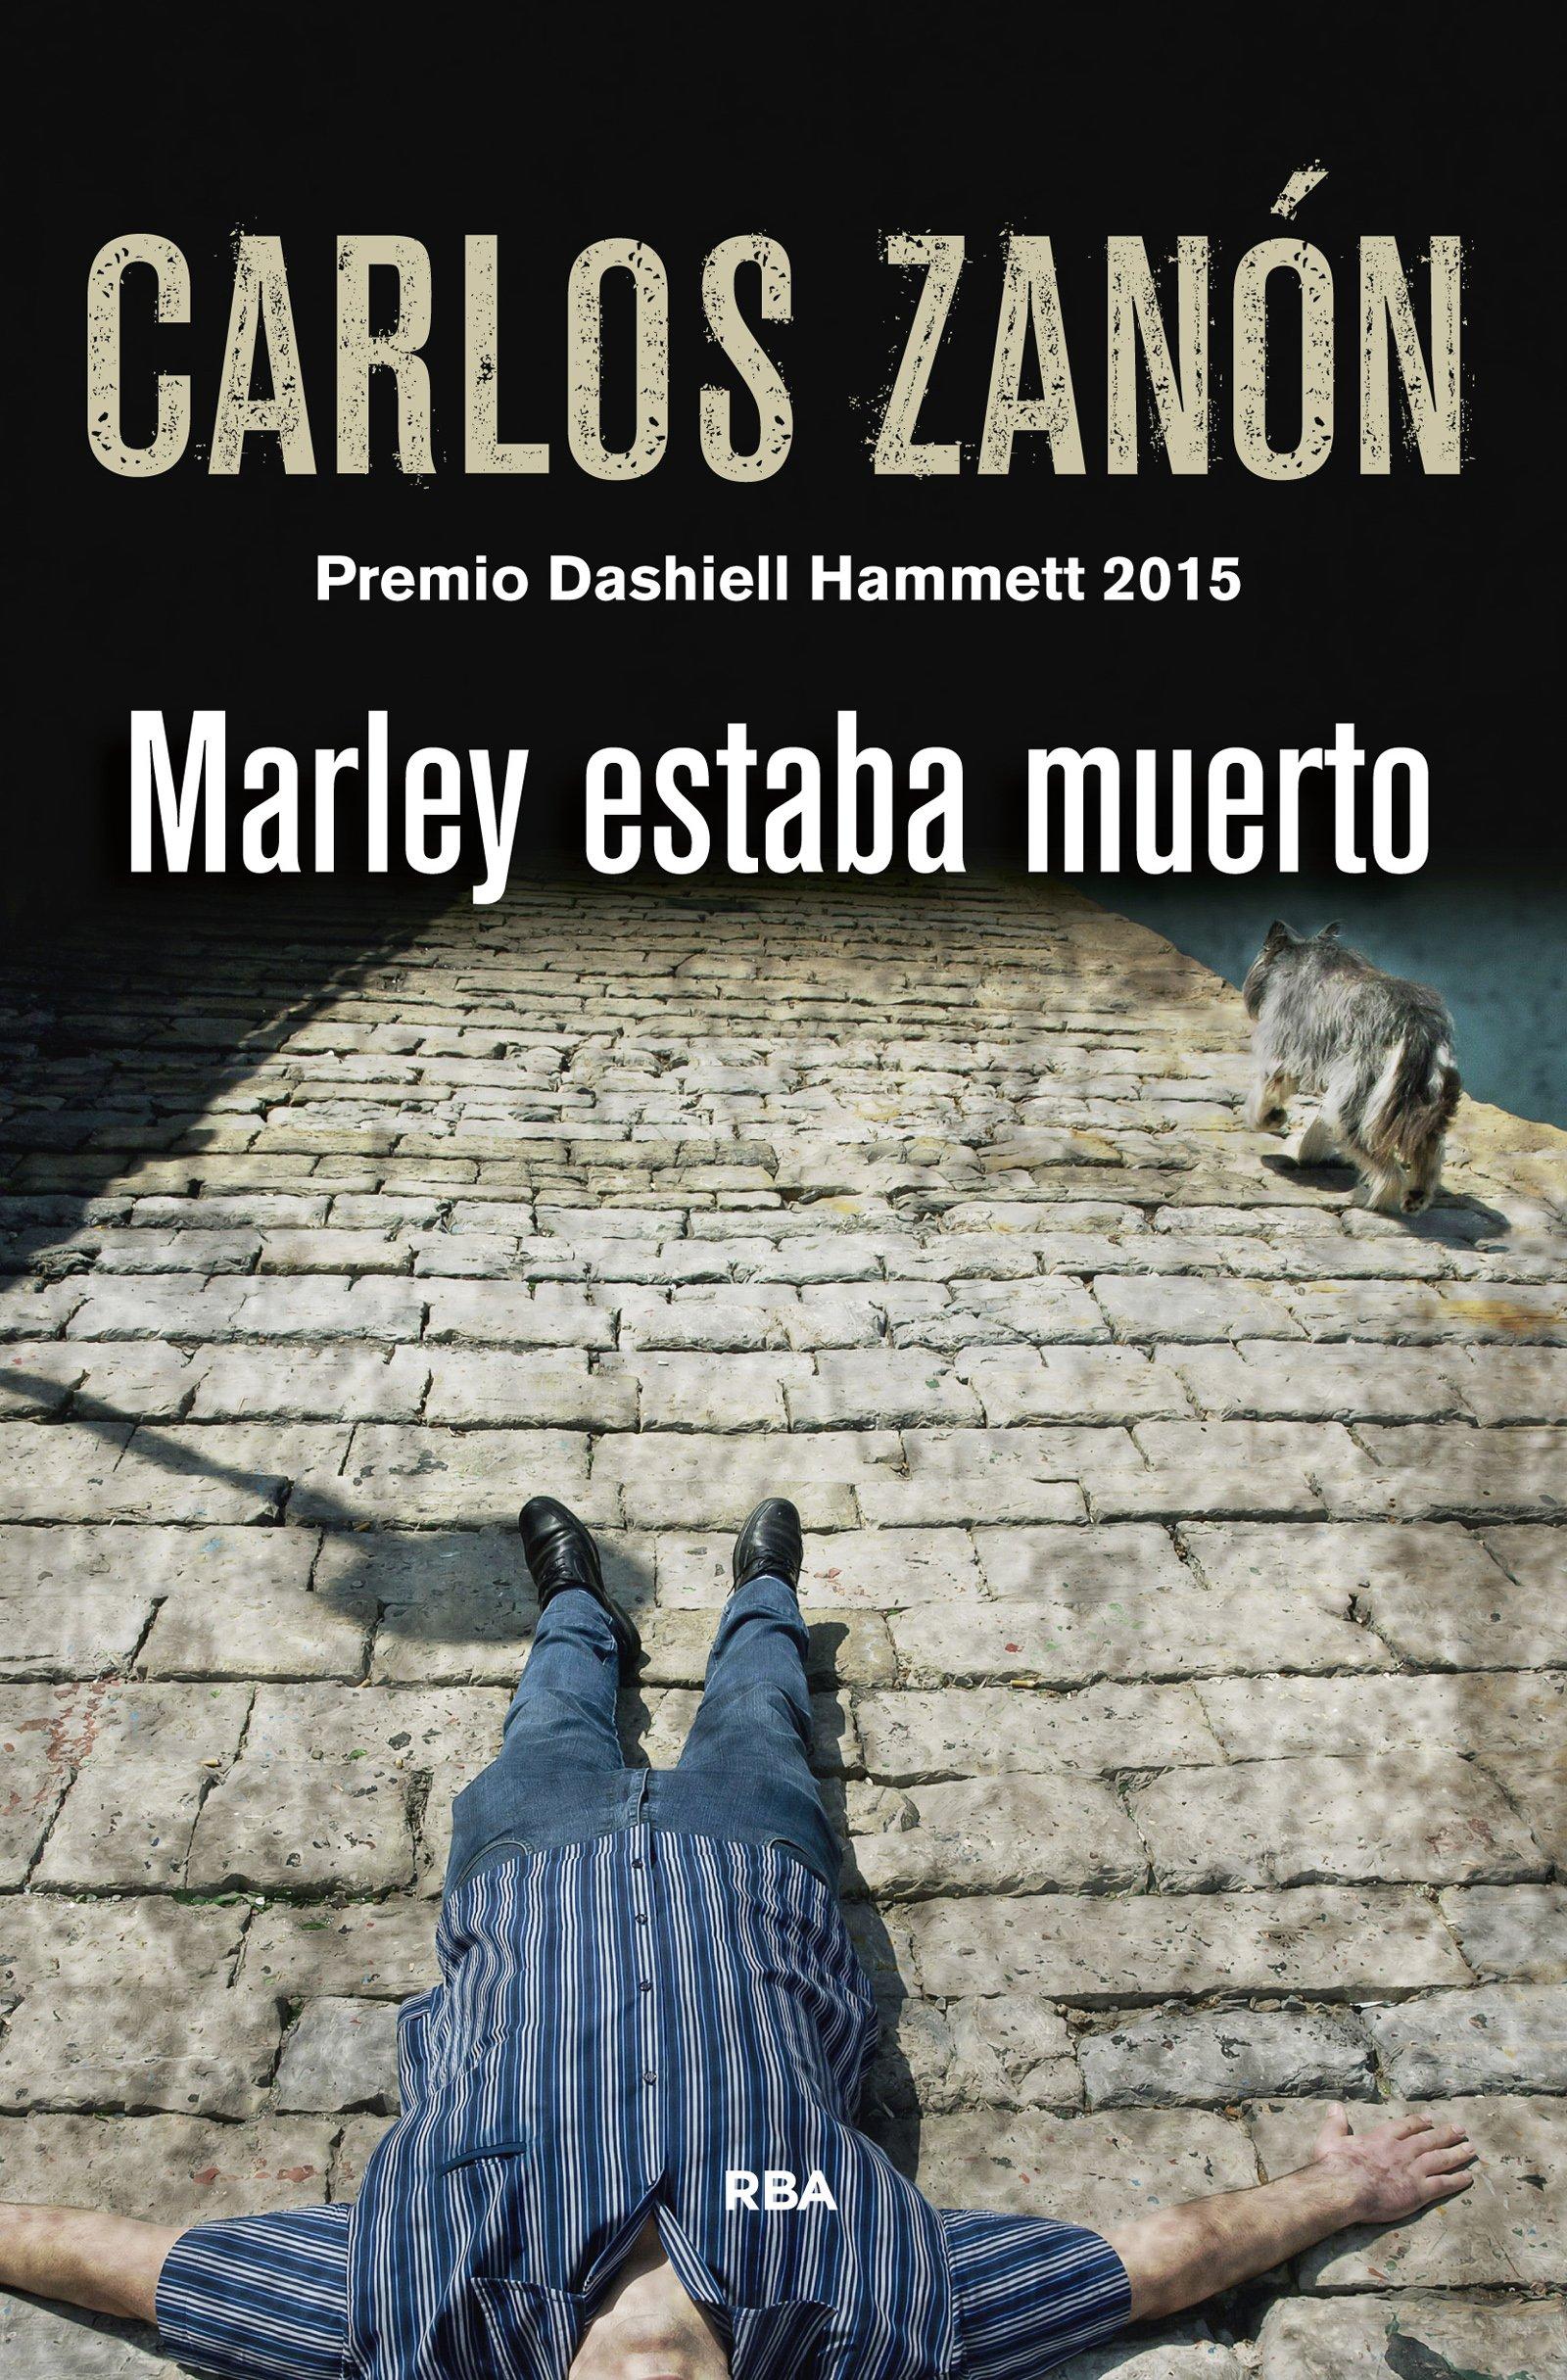 Marley estaba muerto ISBN-13 9788490566282